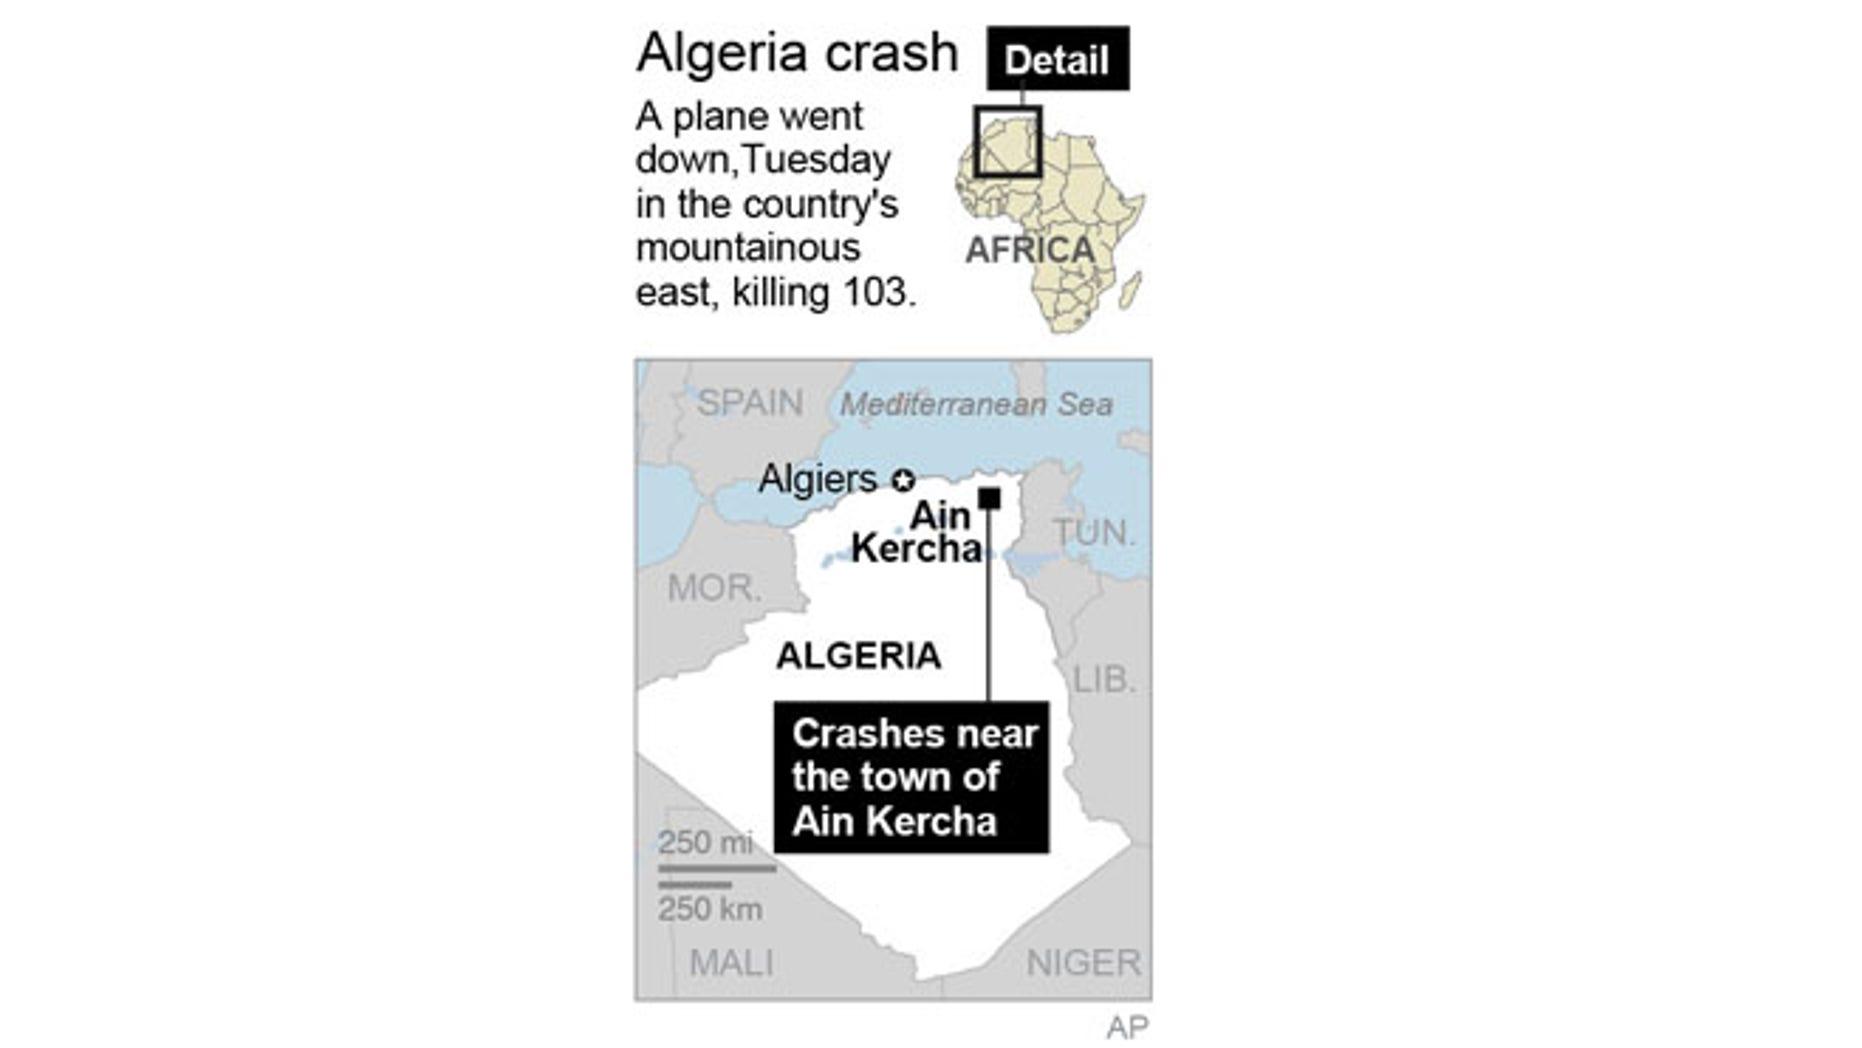 Map locates Ain Kercha, Algeria.; 1c x 3 inches; 46.5 mm x 76 mm;